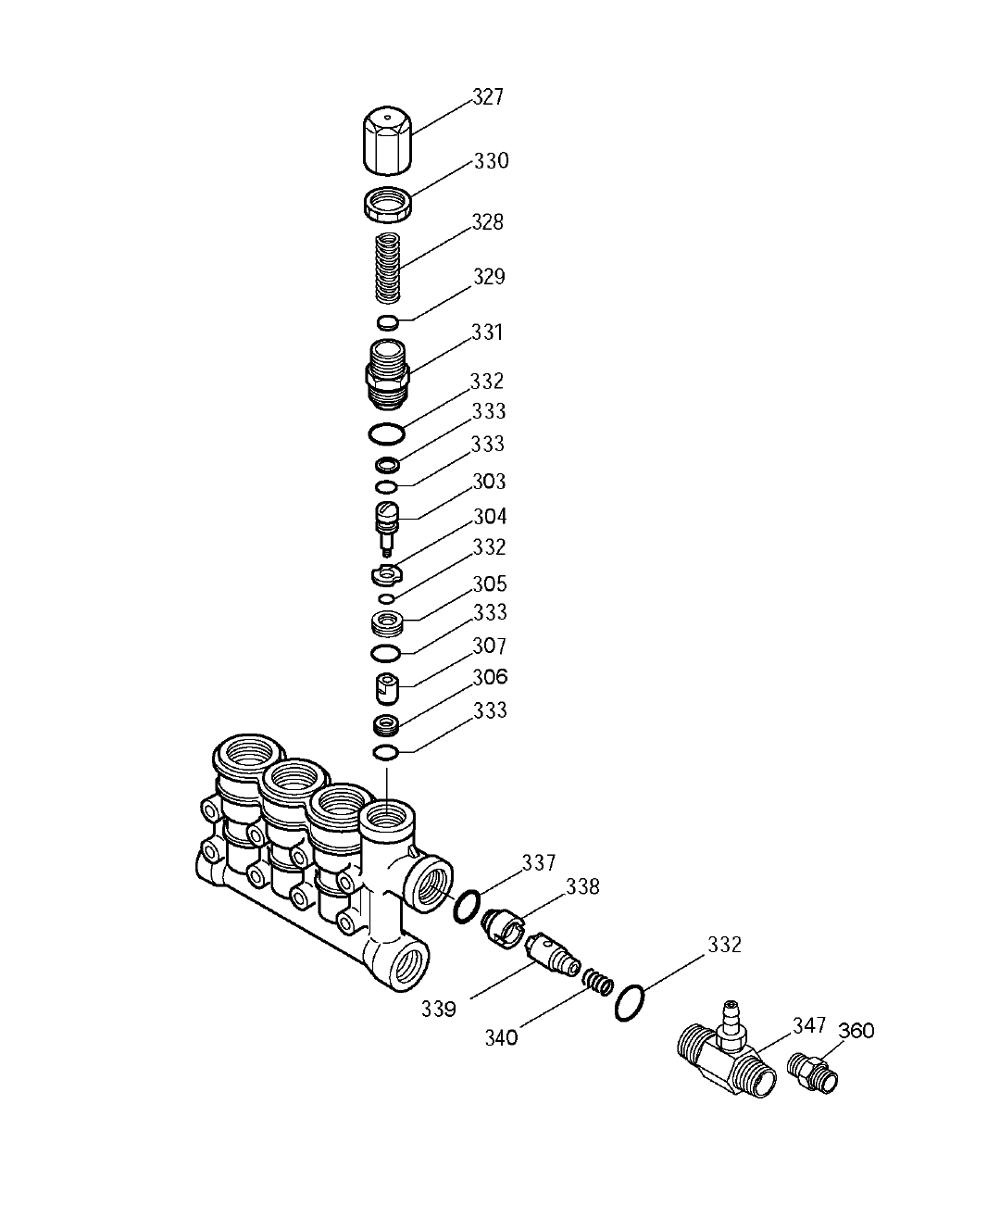 DXPW60603-T0-Dewalt-PB-1Break Down